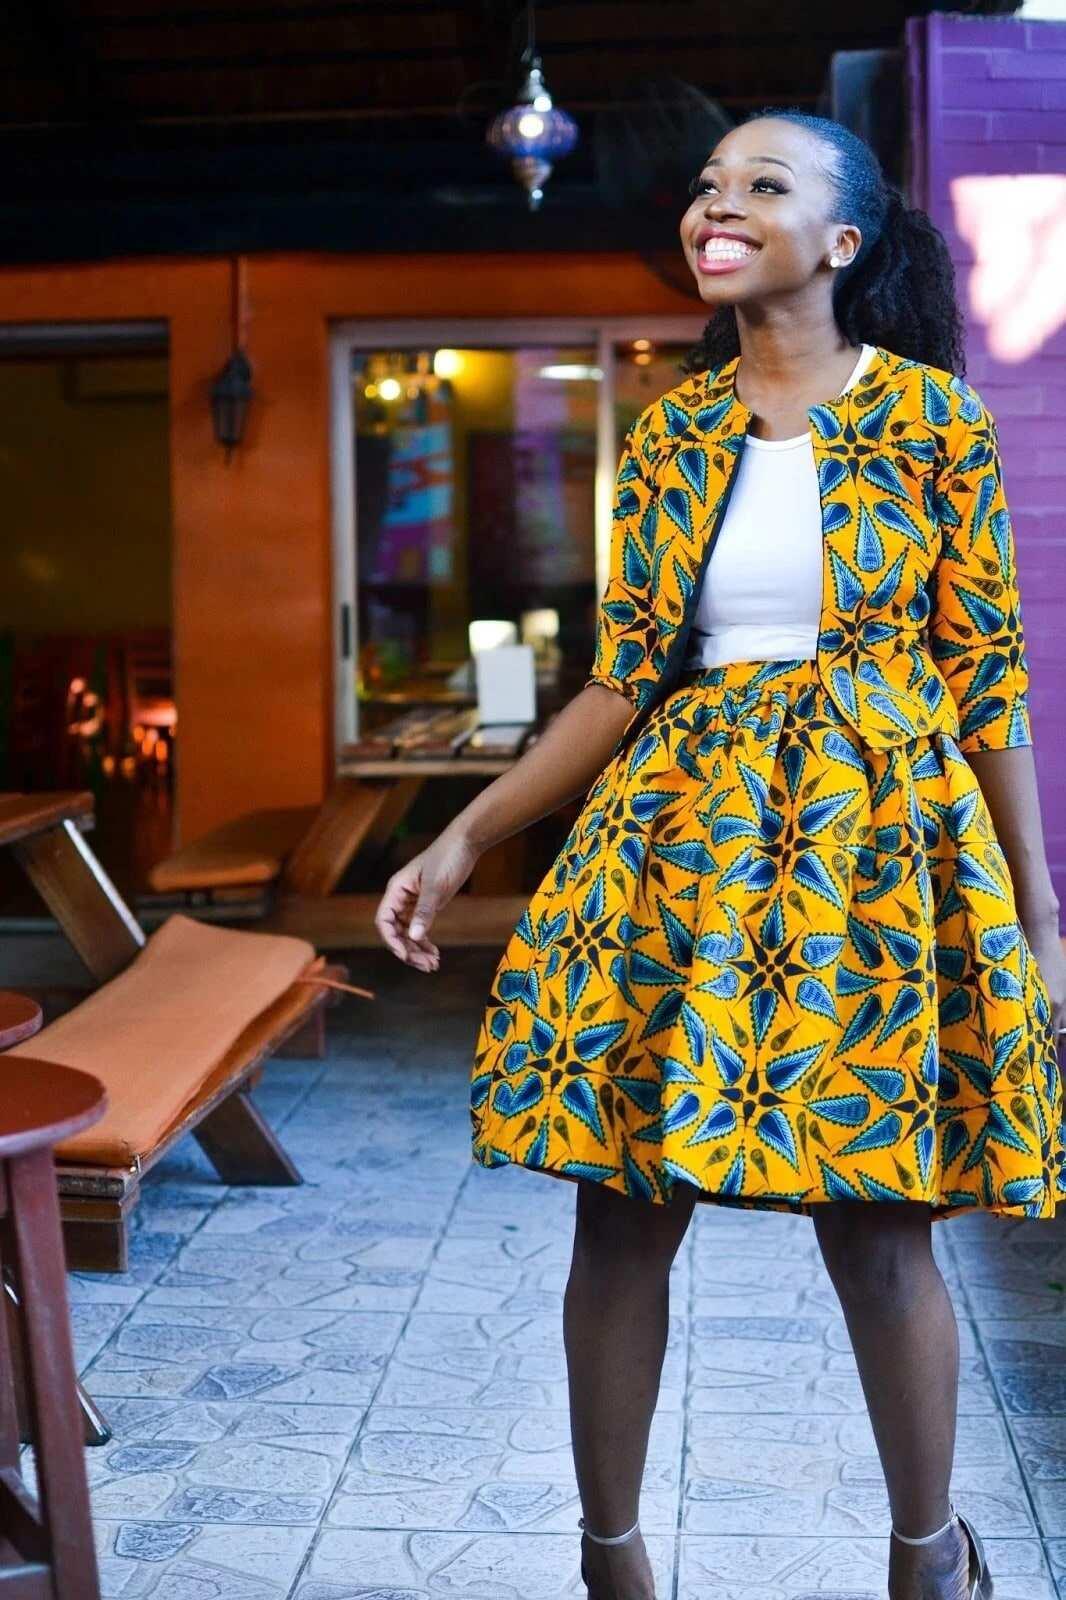 ankara short skirt and blouse styles, ankara skirts , ankara blouse styles